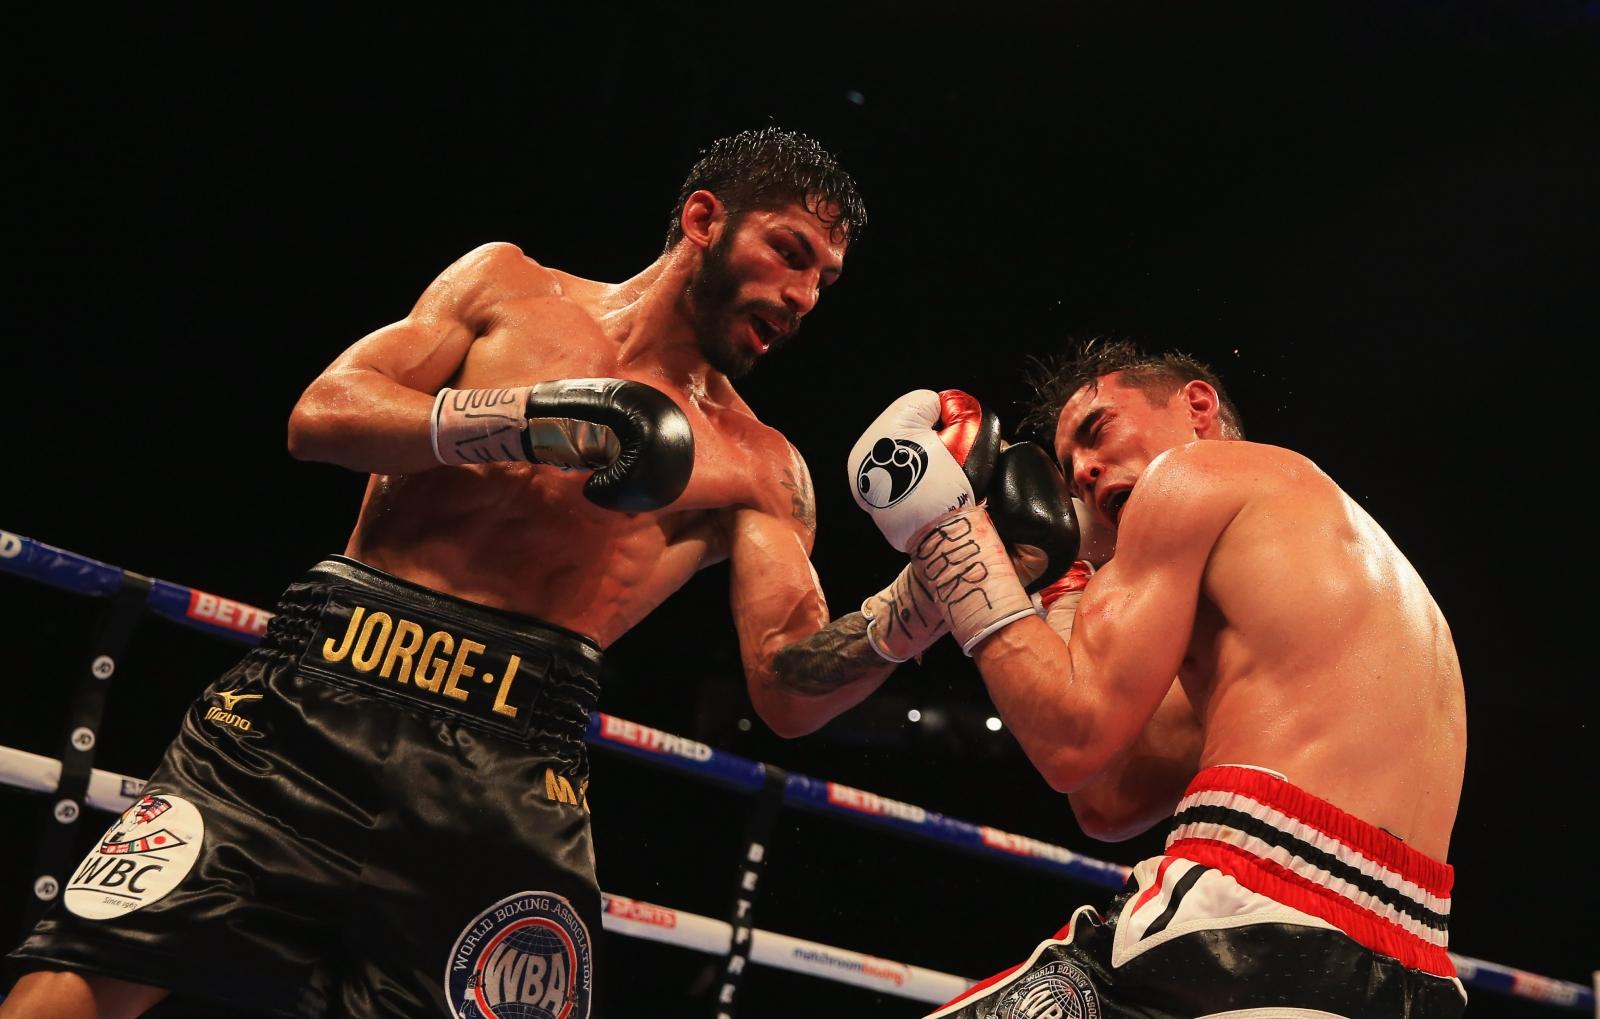 Anthony Crolla vs Jorge Linares